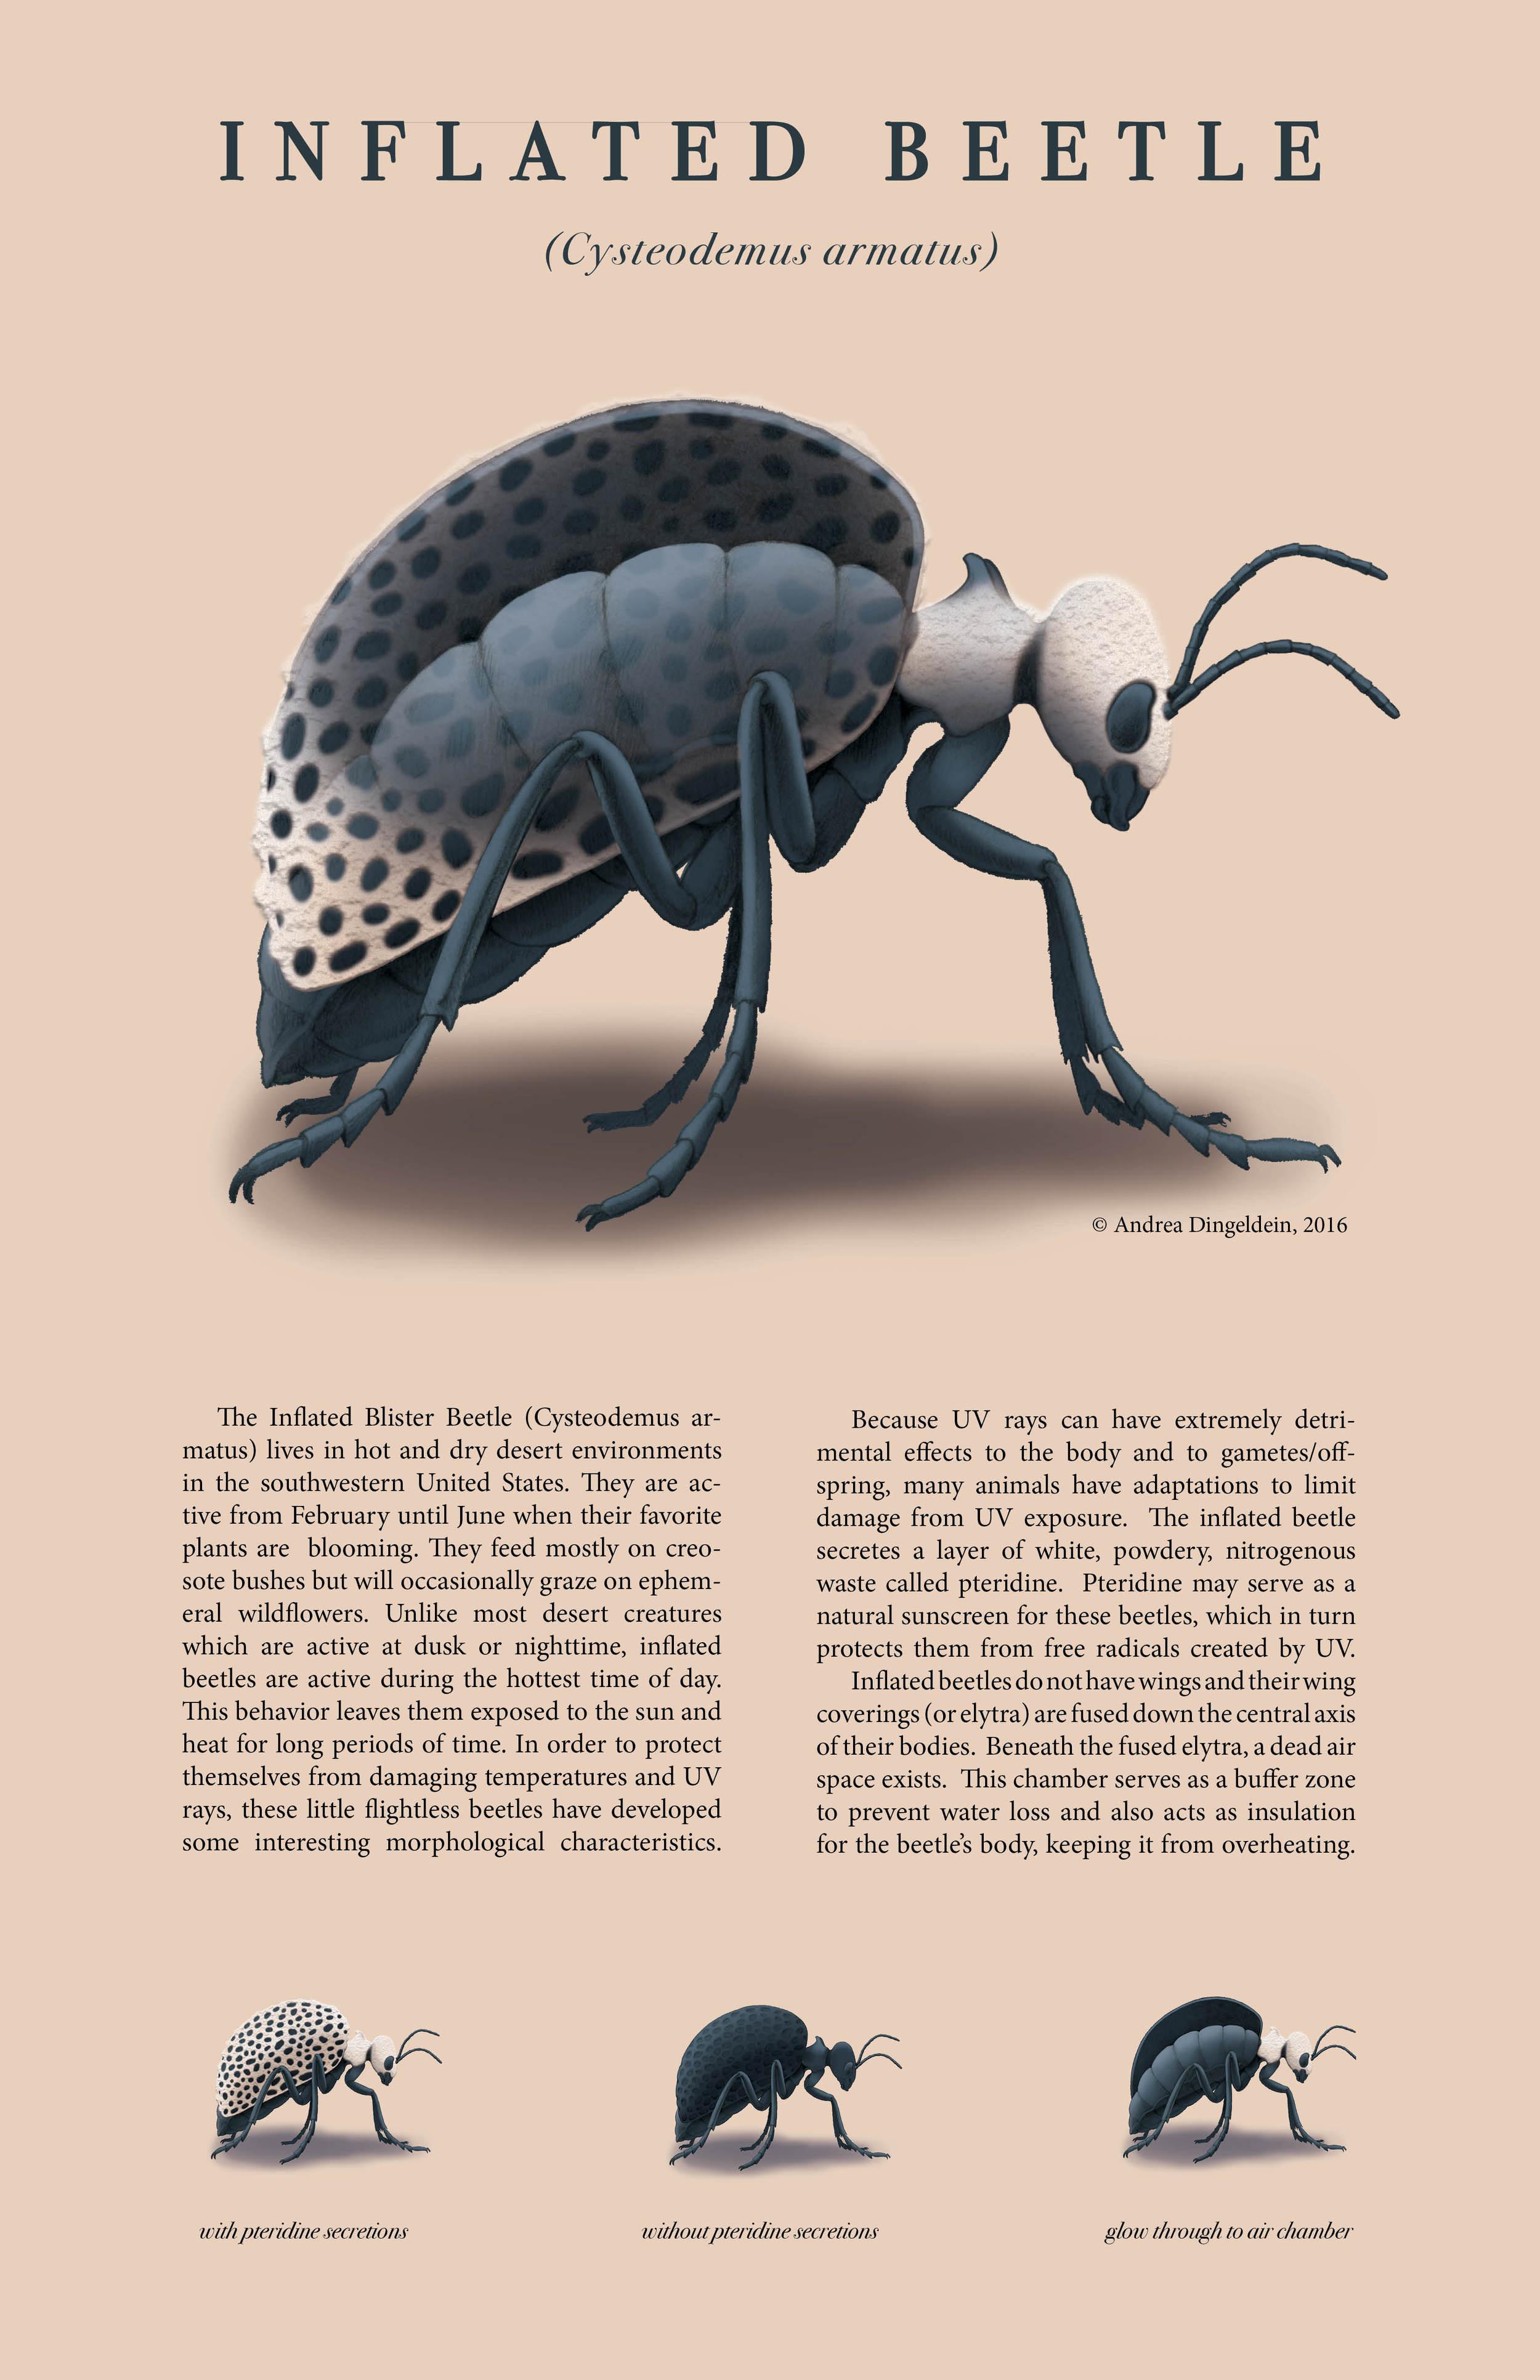 Inflated Beetle